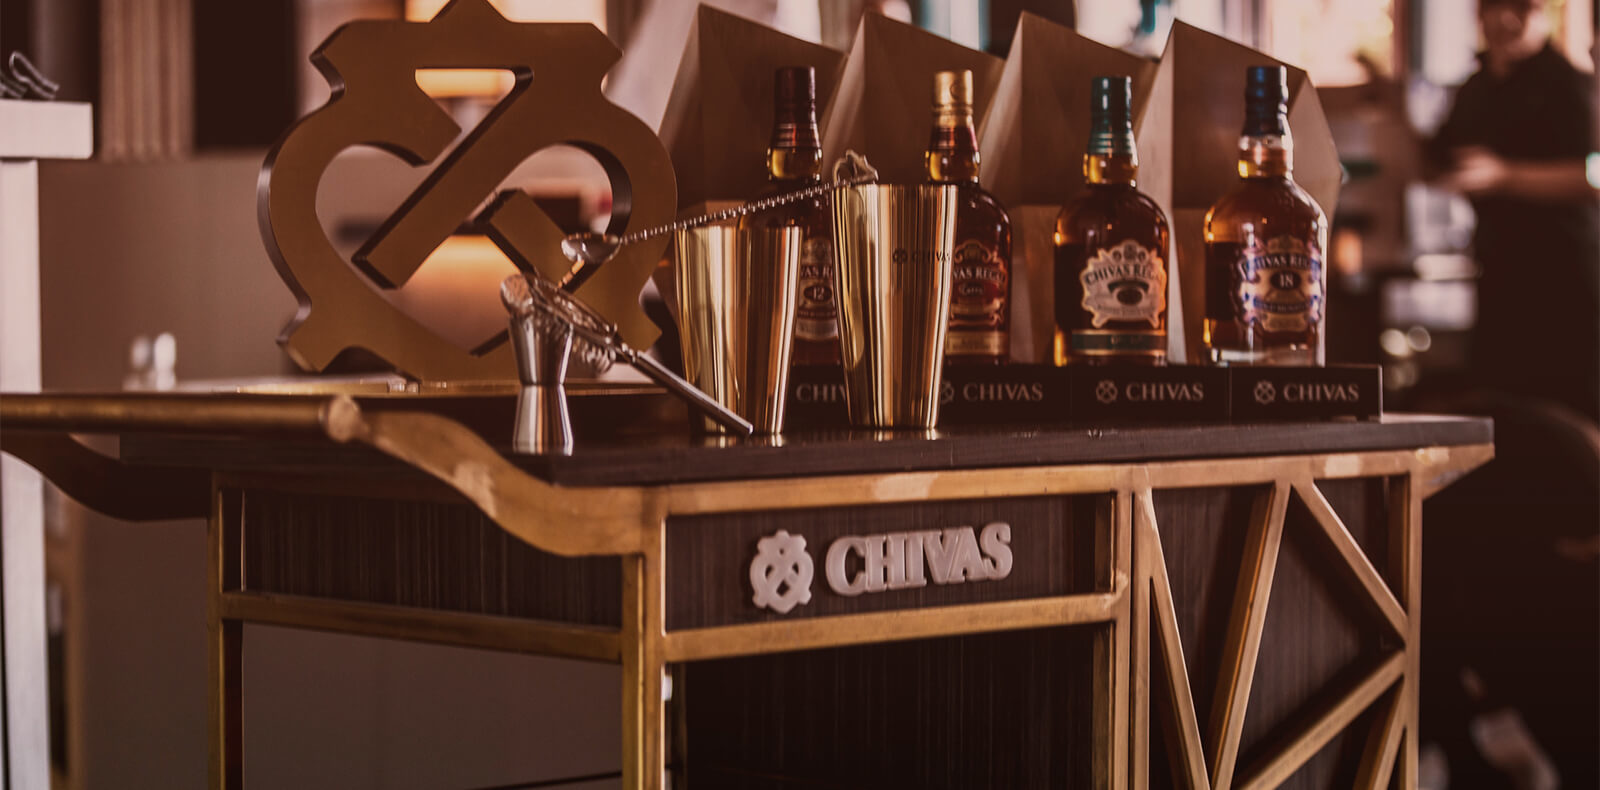 Chivas Tasting Session